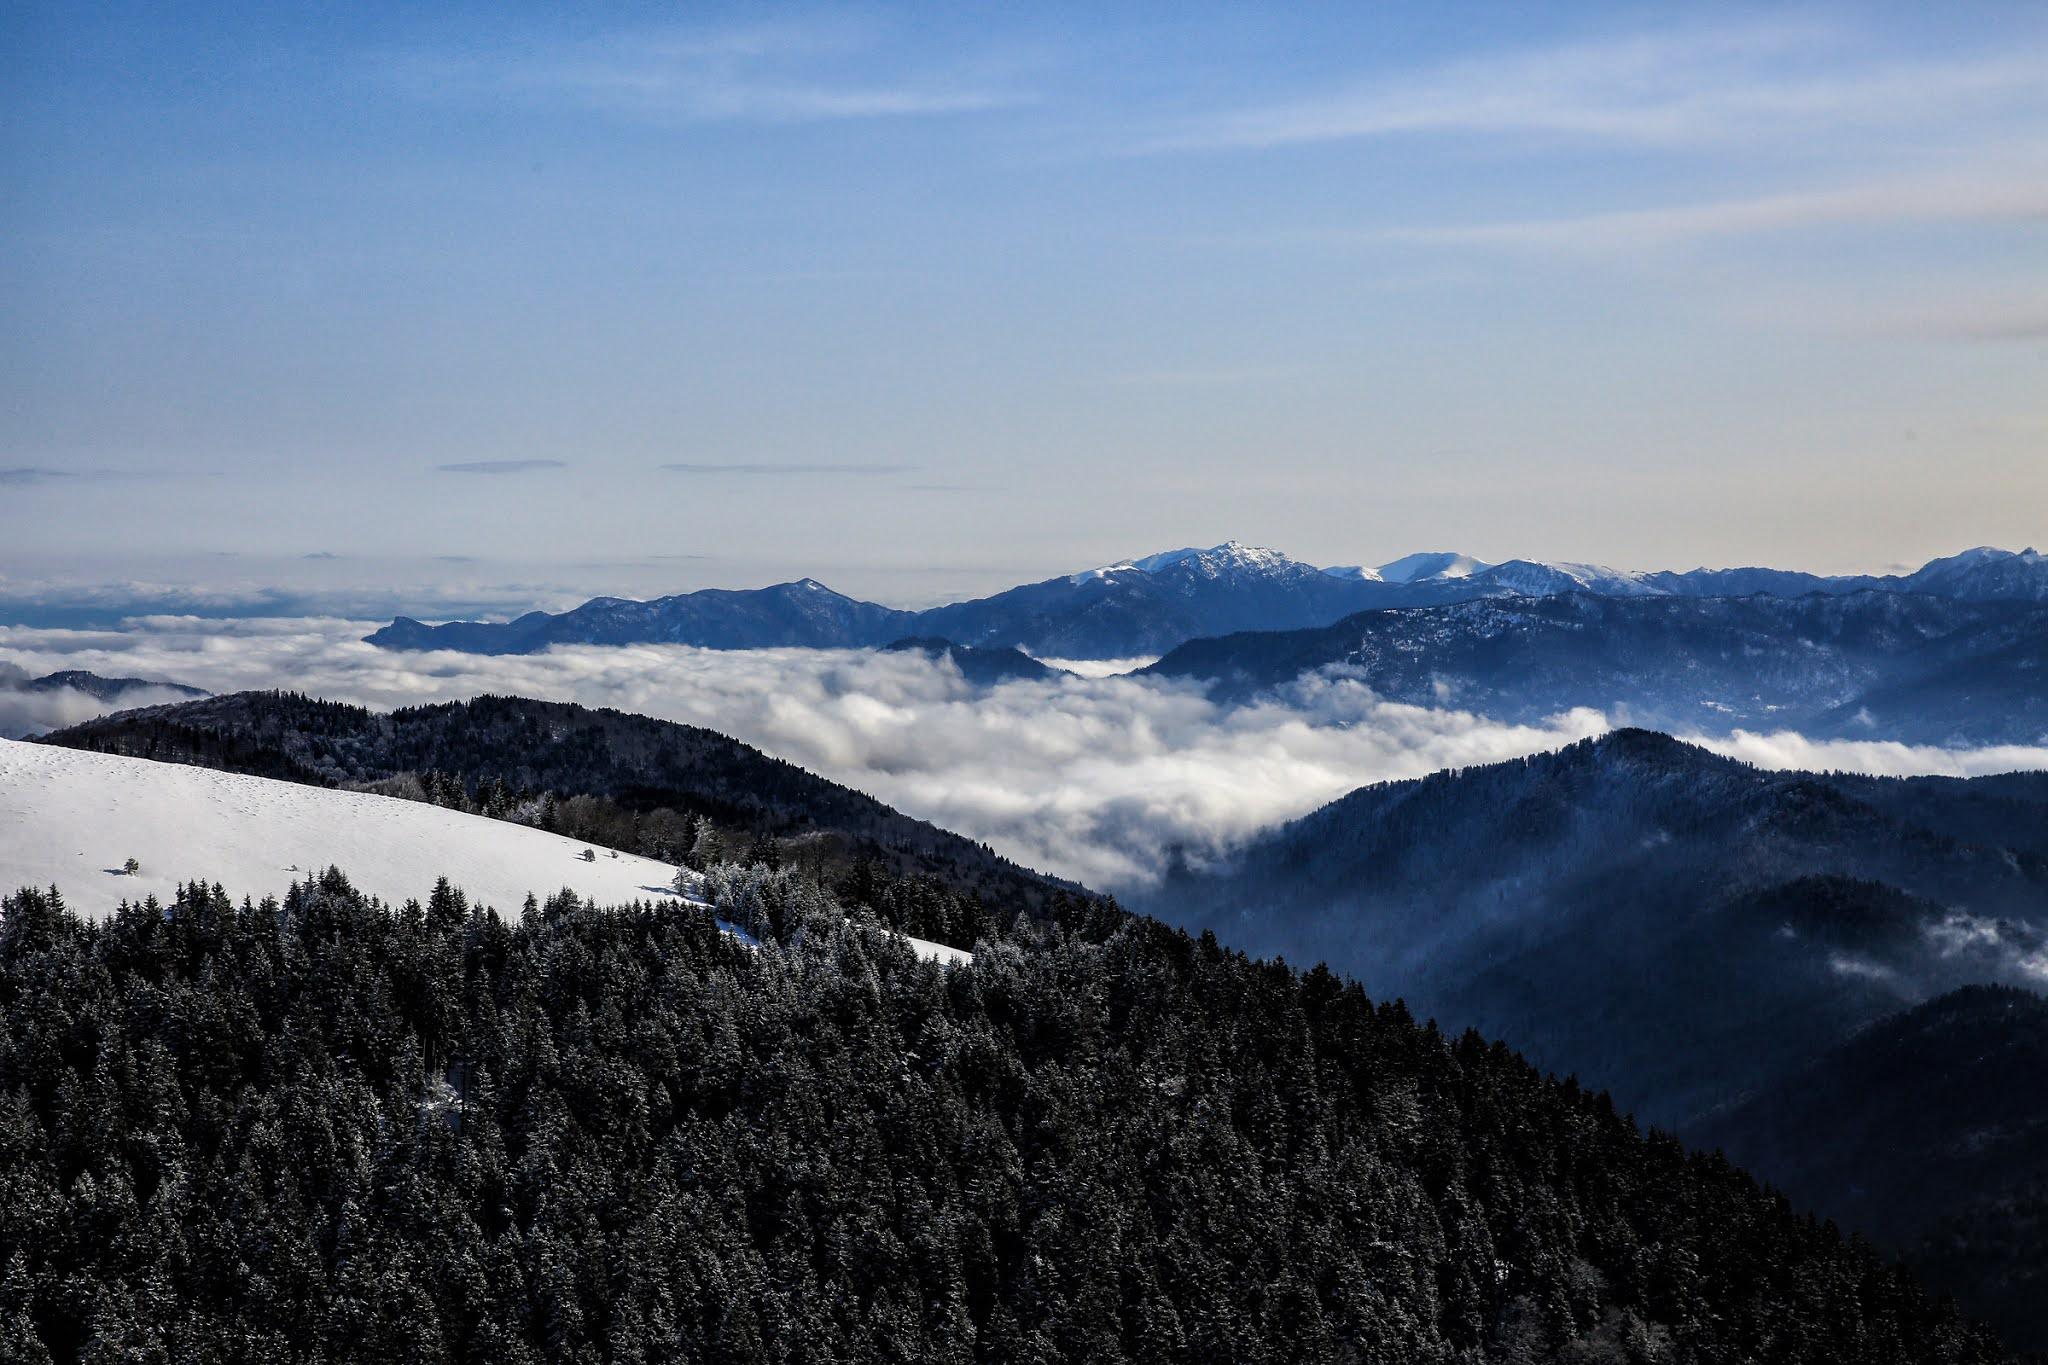 Borjomi-Kharagauli National Park 4